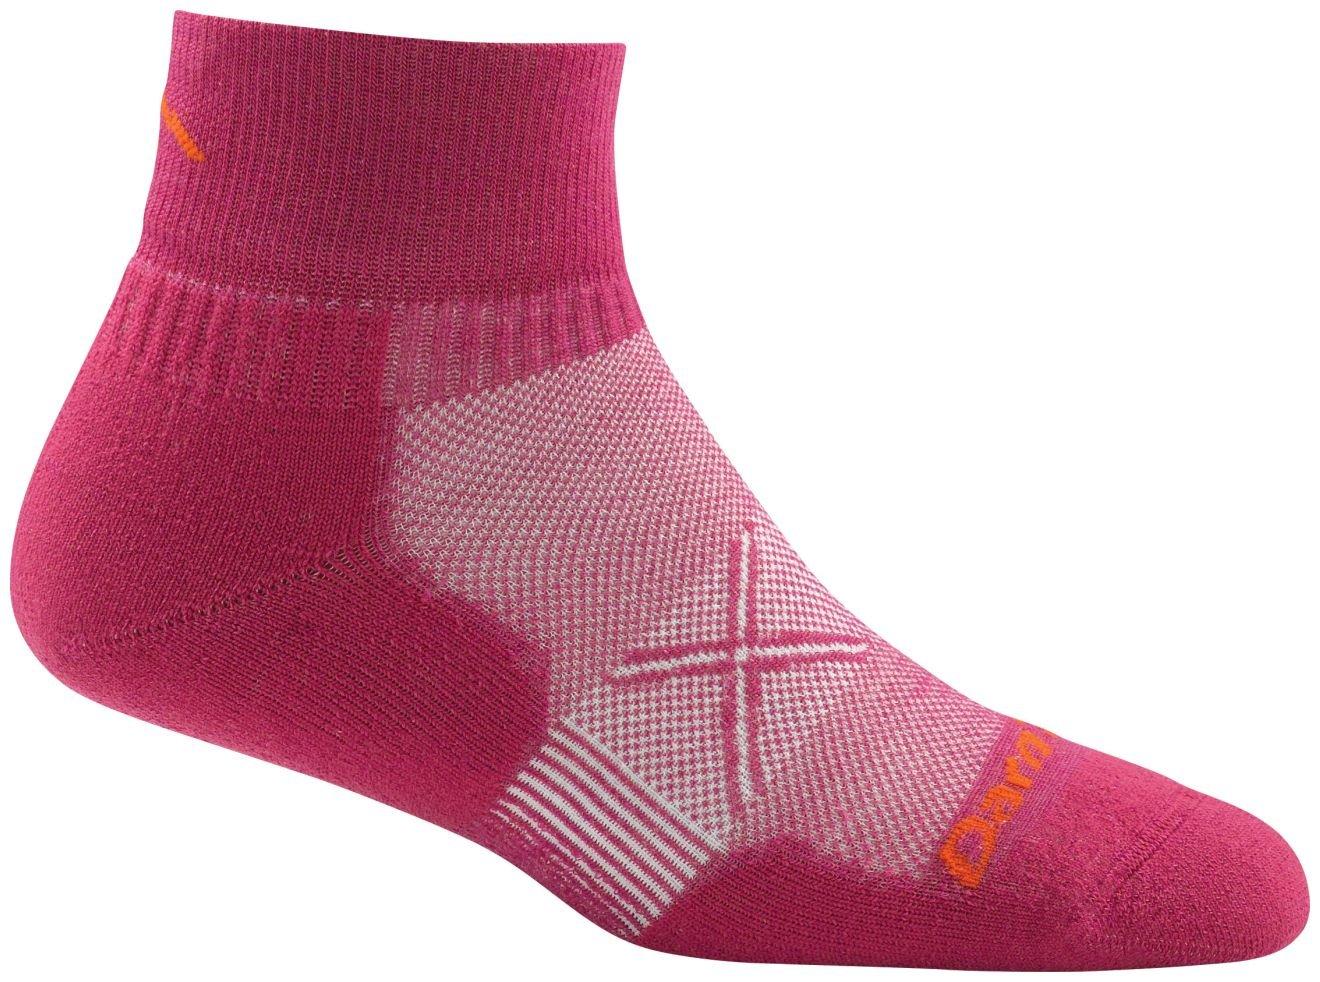 Darn Tough Vertex Quarter Crew Ultralight Cushion Socks - Women's Boysenberry Medium